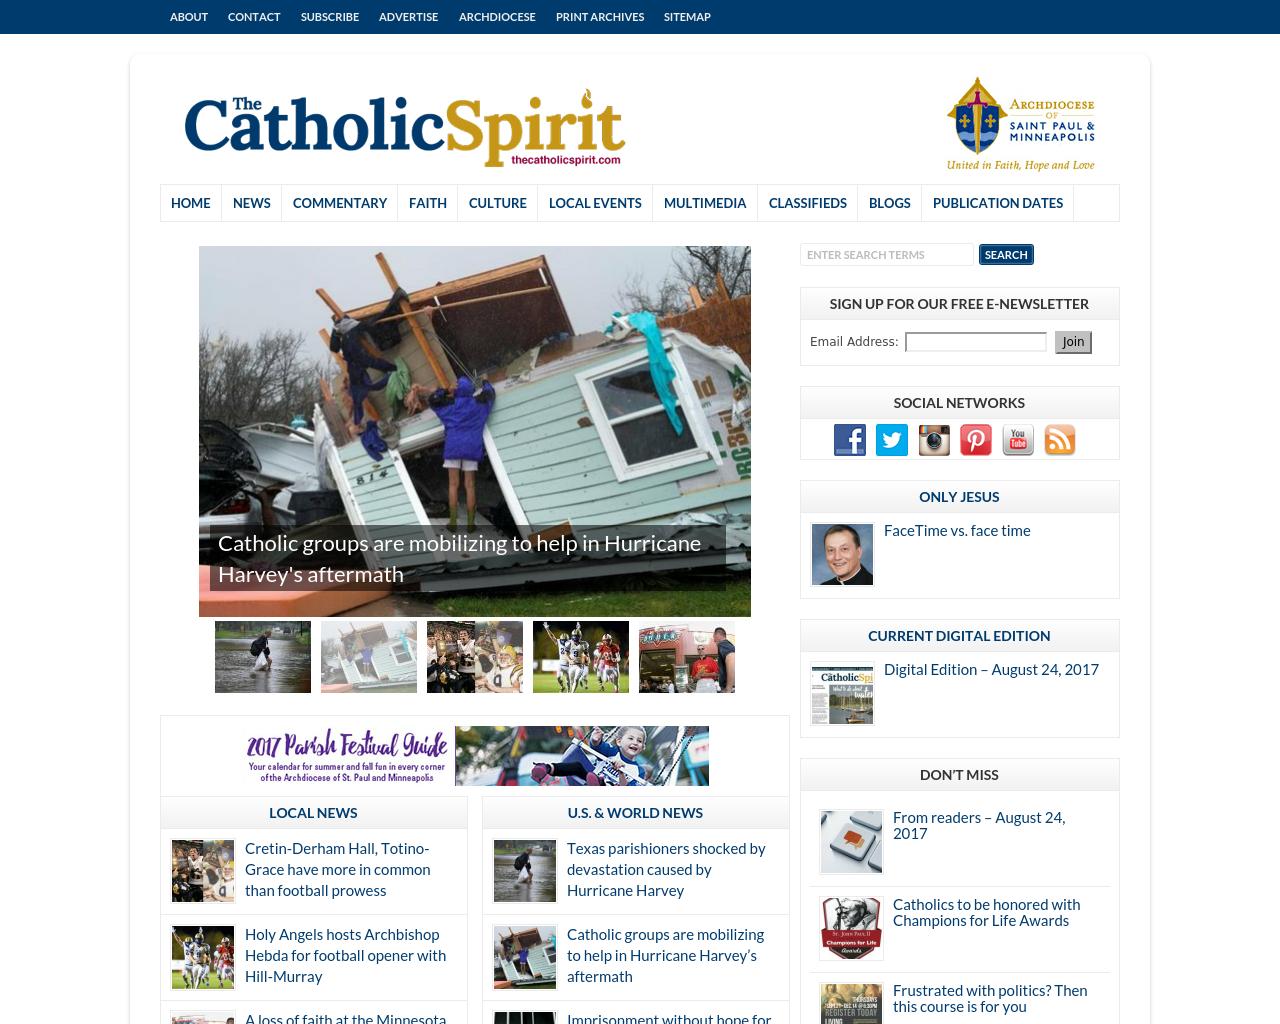 The-Catholic-Spirit-Advertising-Reviews-Pricing